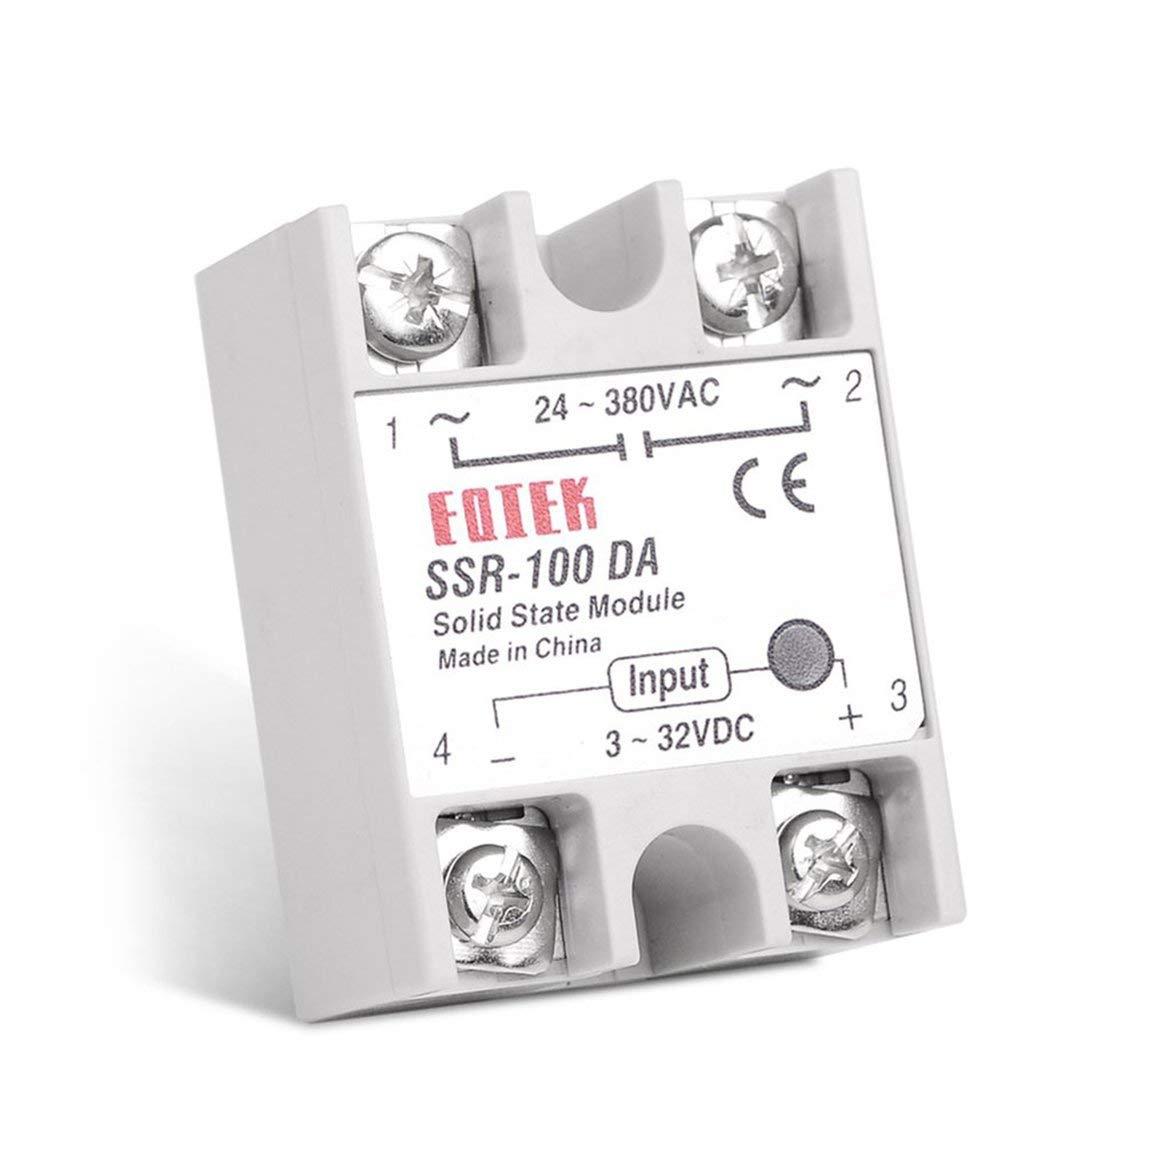 Farbe: wei/ß Solid State Relais DC-AC 10A 25A 40A 60A 80A 100A 12V 3-32V DC bis 220 V AC 24-380V Last einphasig SSR f/ür die Temperaturregelung -1